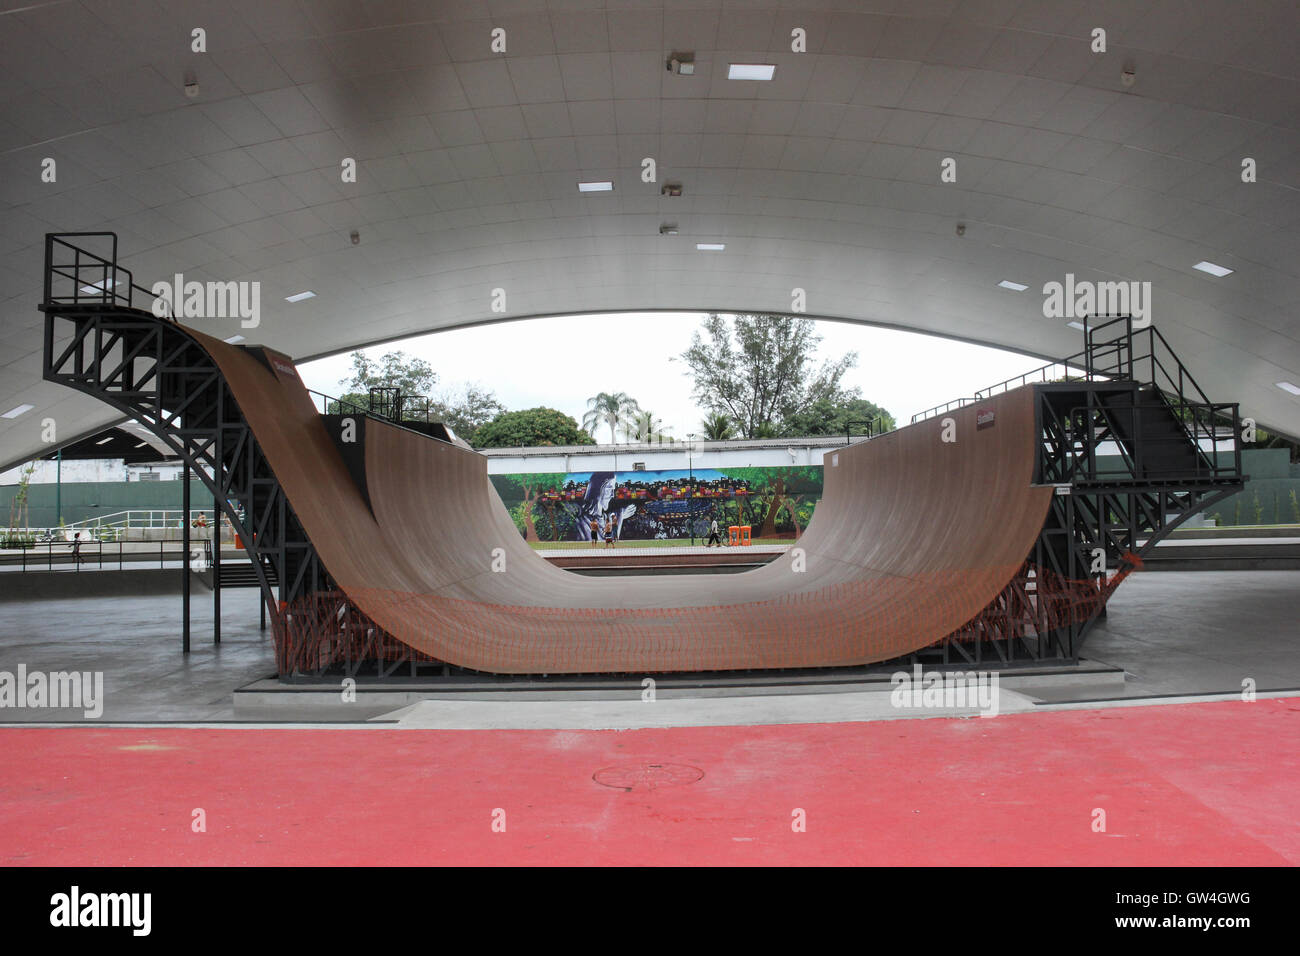 Rio de Janeiro, Brazil, 10 September, 2016: Madureira Park holds the world's largest public half pipe skate park, Stock Photo